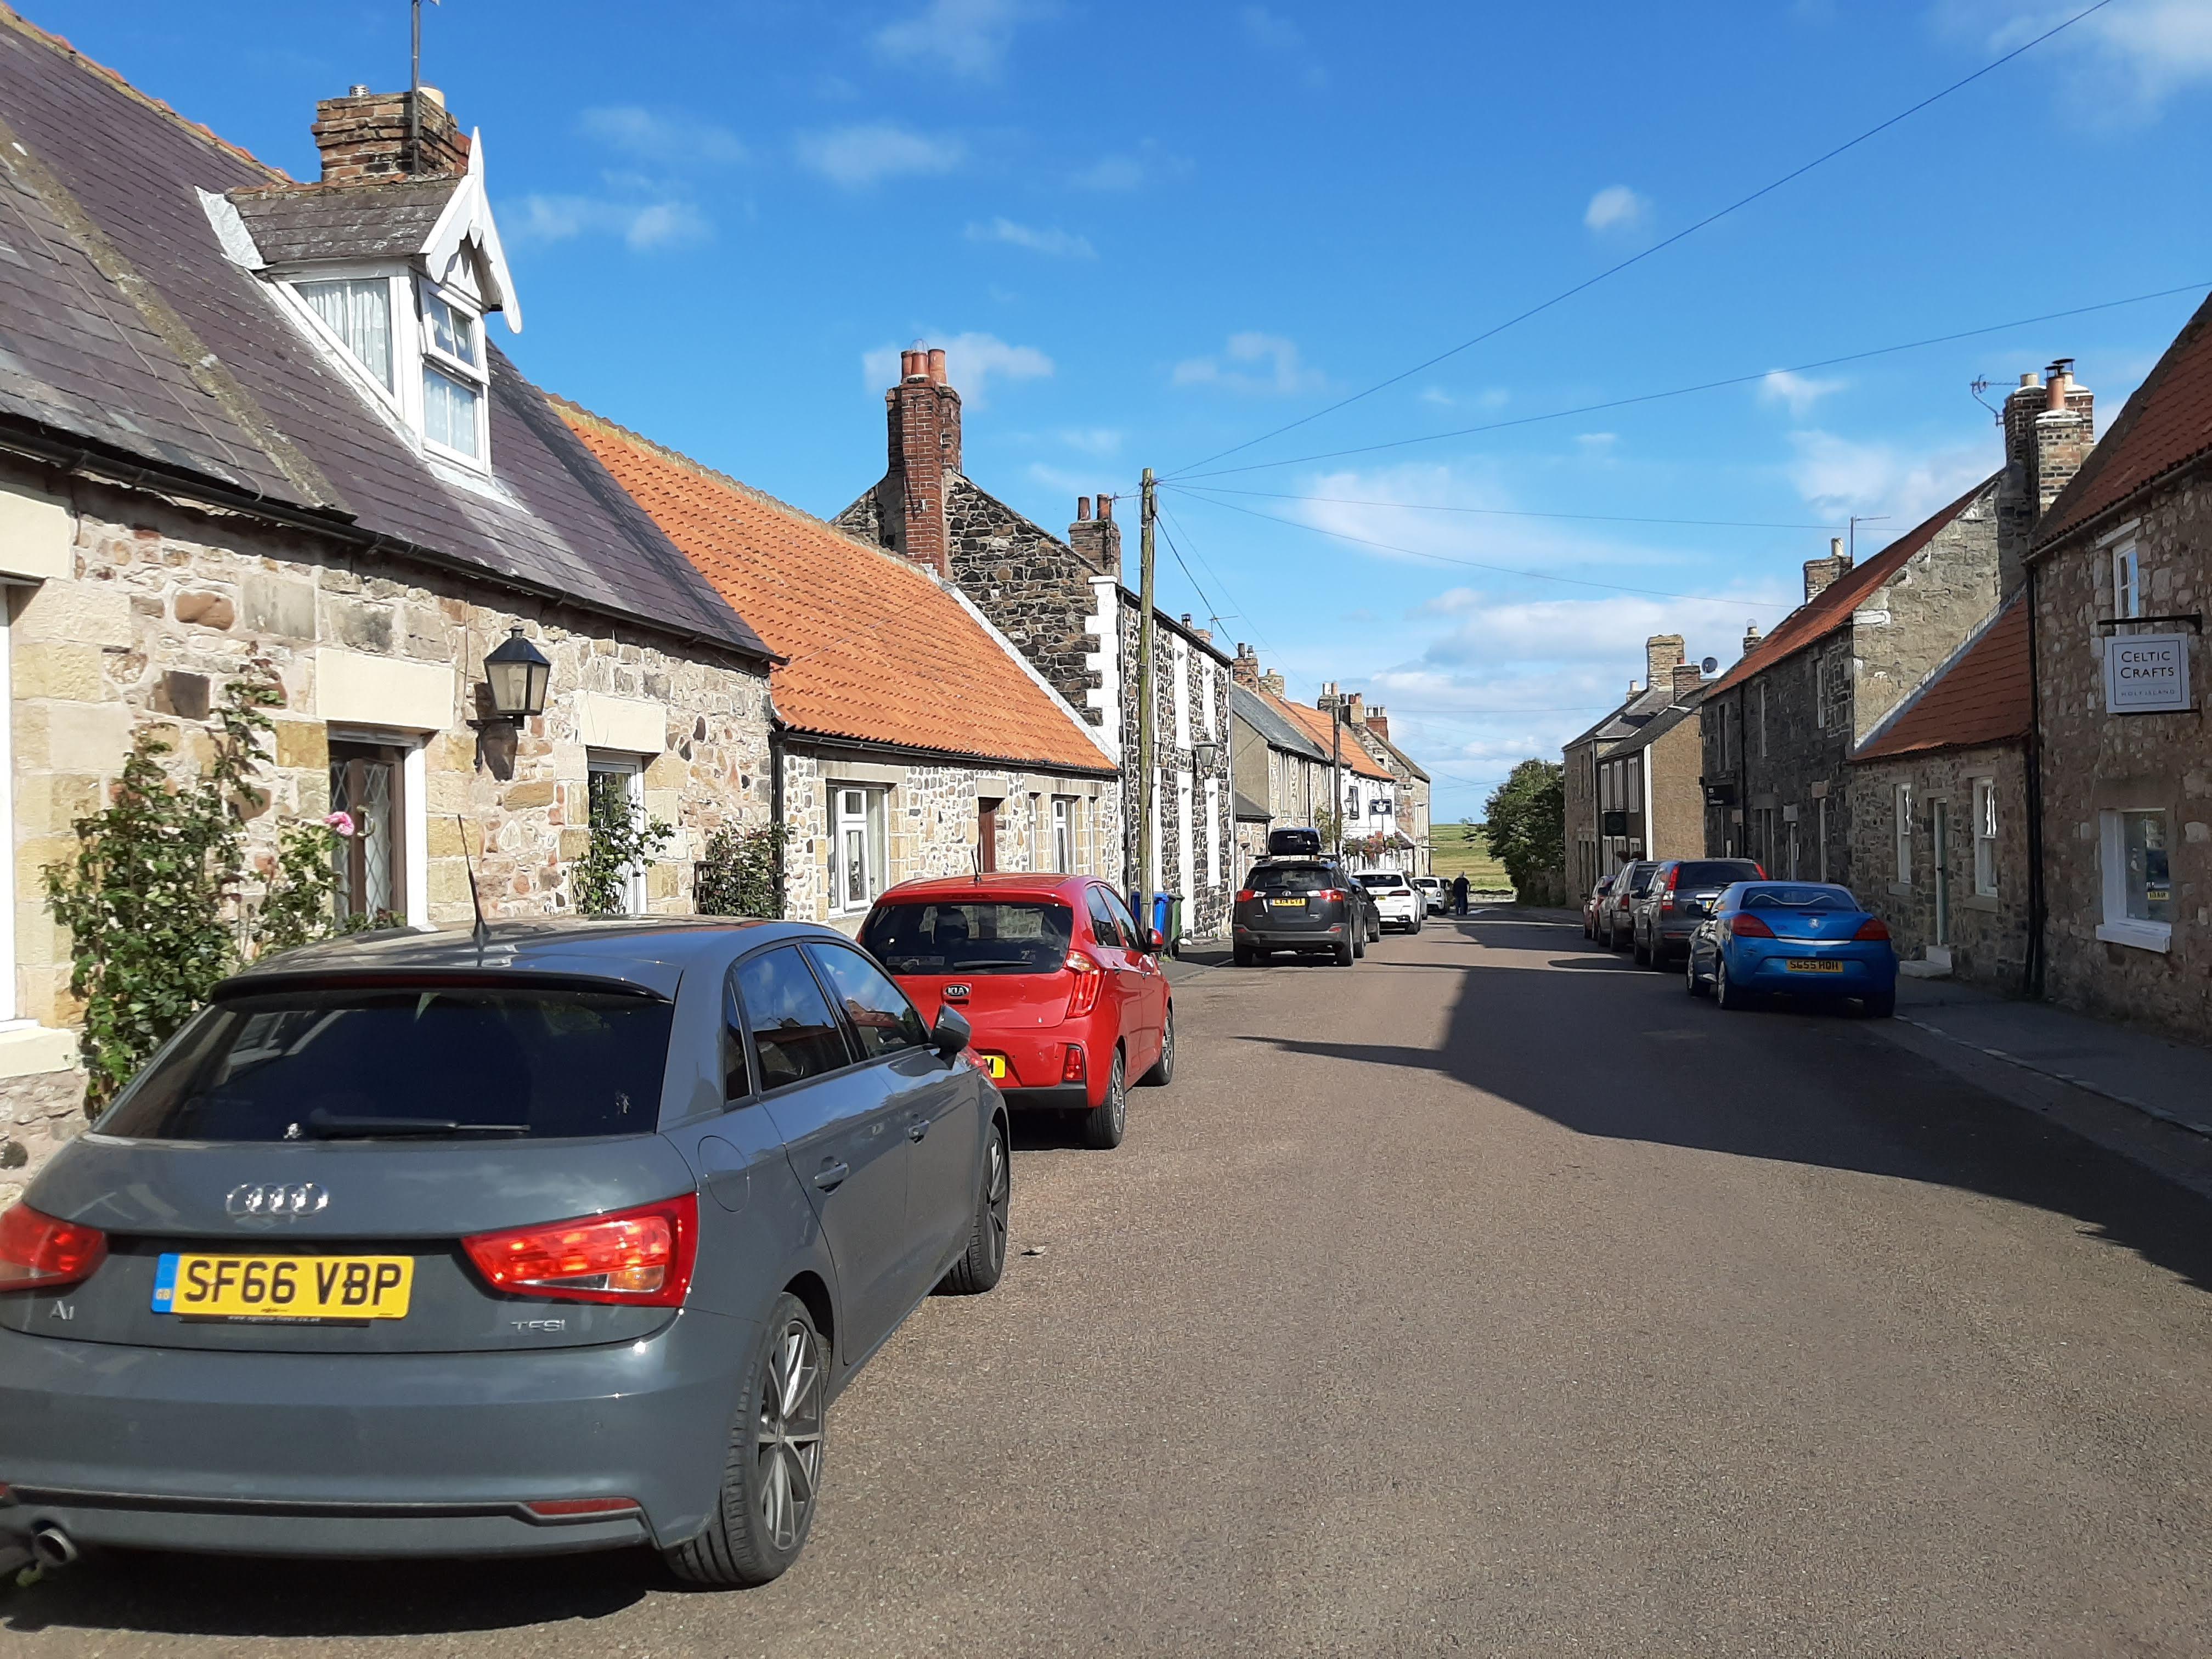 The village of Lindisfarne